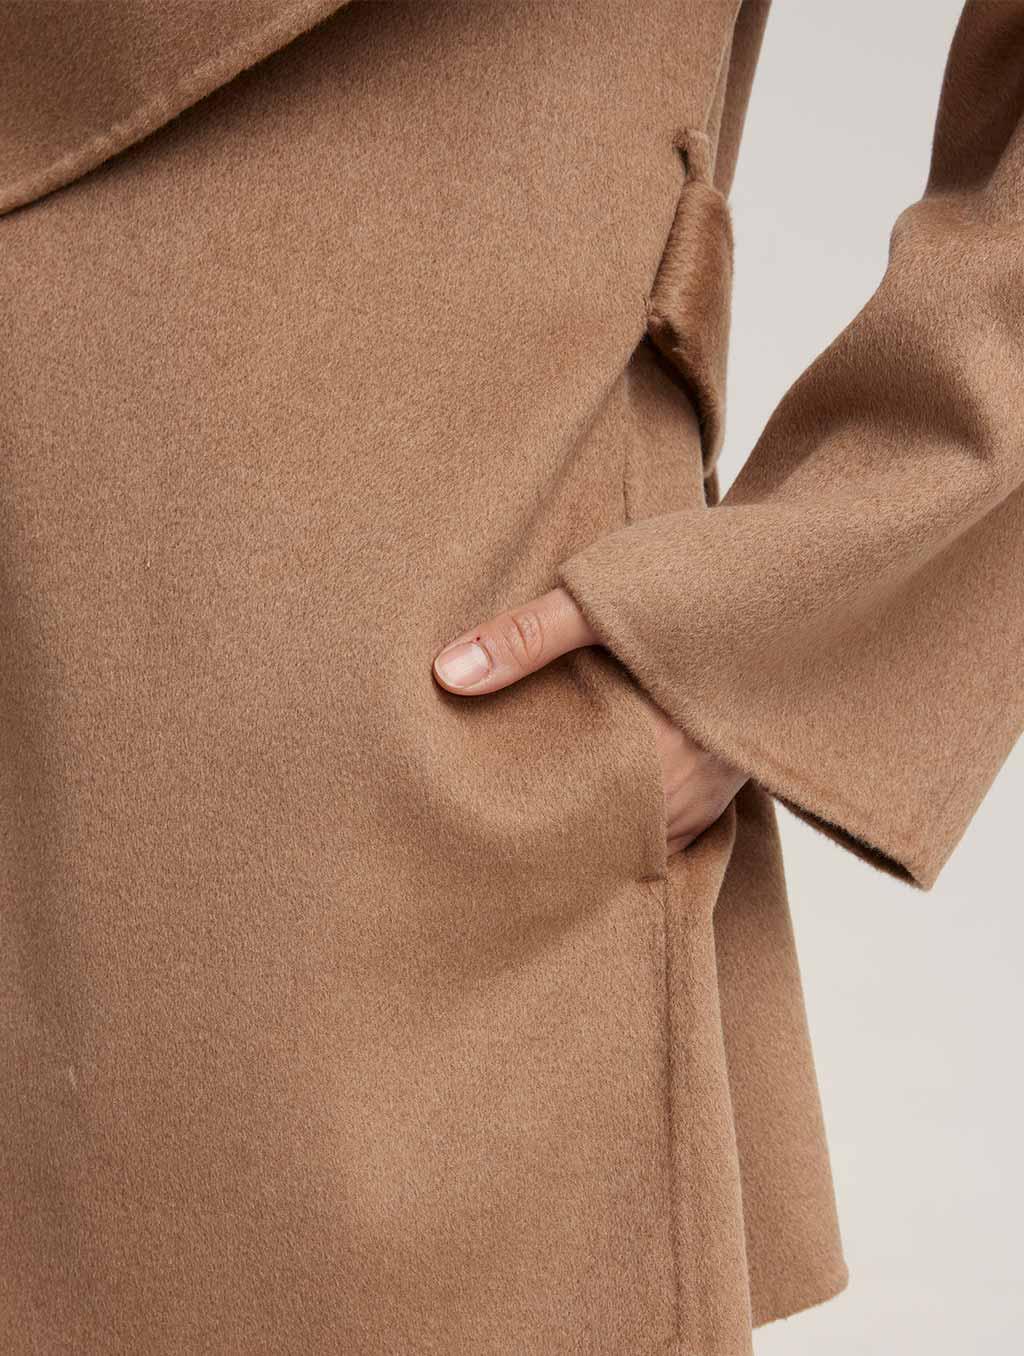 Waisted Belted 100% Camel Hair Coat - detail- Camel2